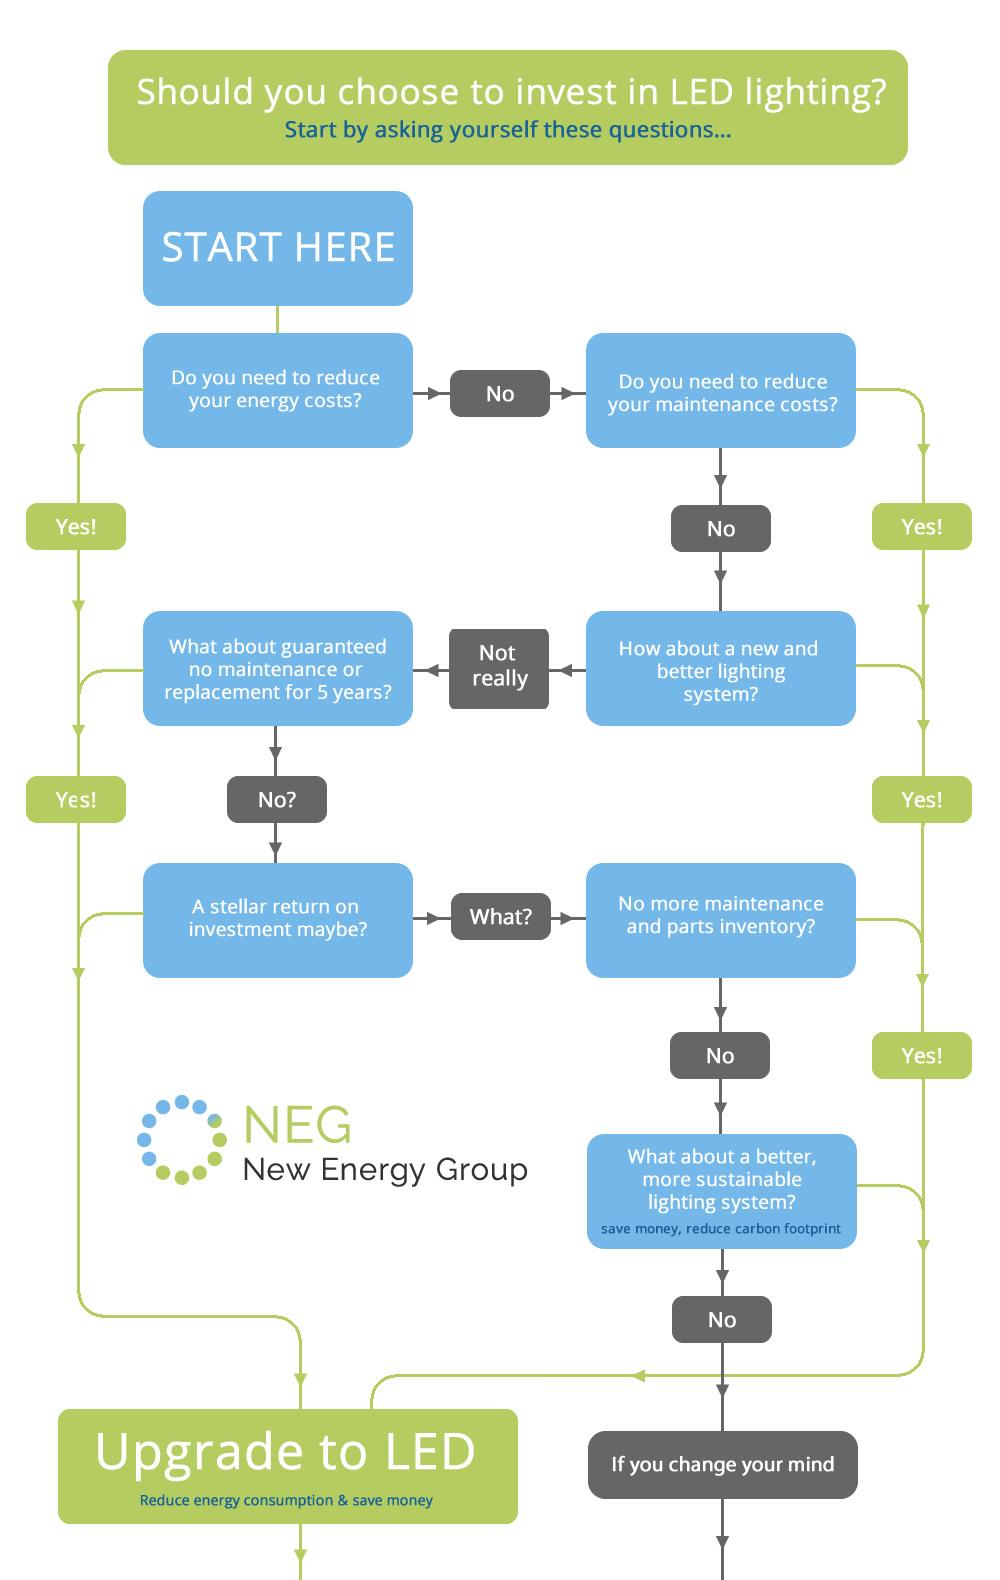 why-choose-LED-flowchart